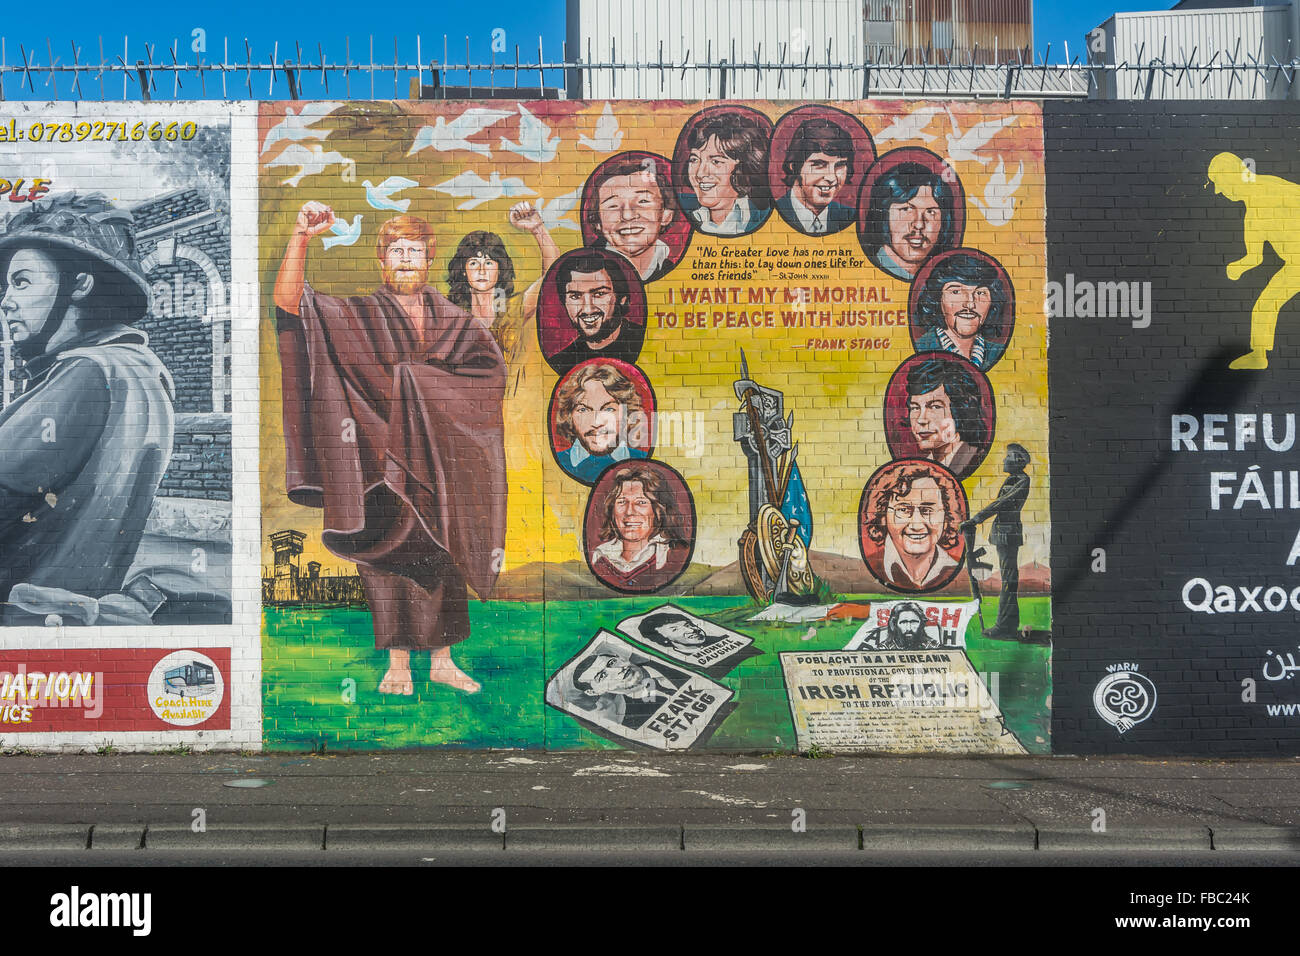 Irish Hunger Striker Mural on Belfast's International Wall on the Falls Road. - Stock Image